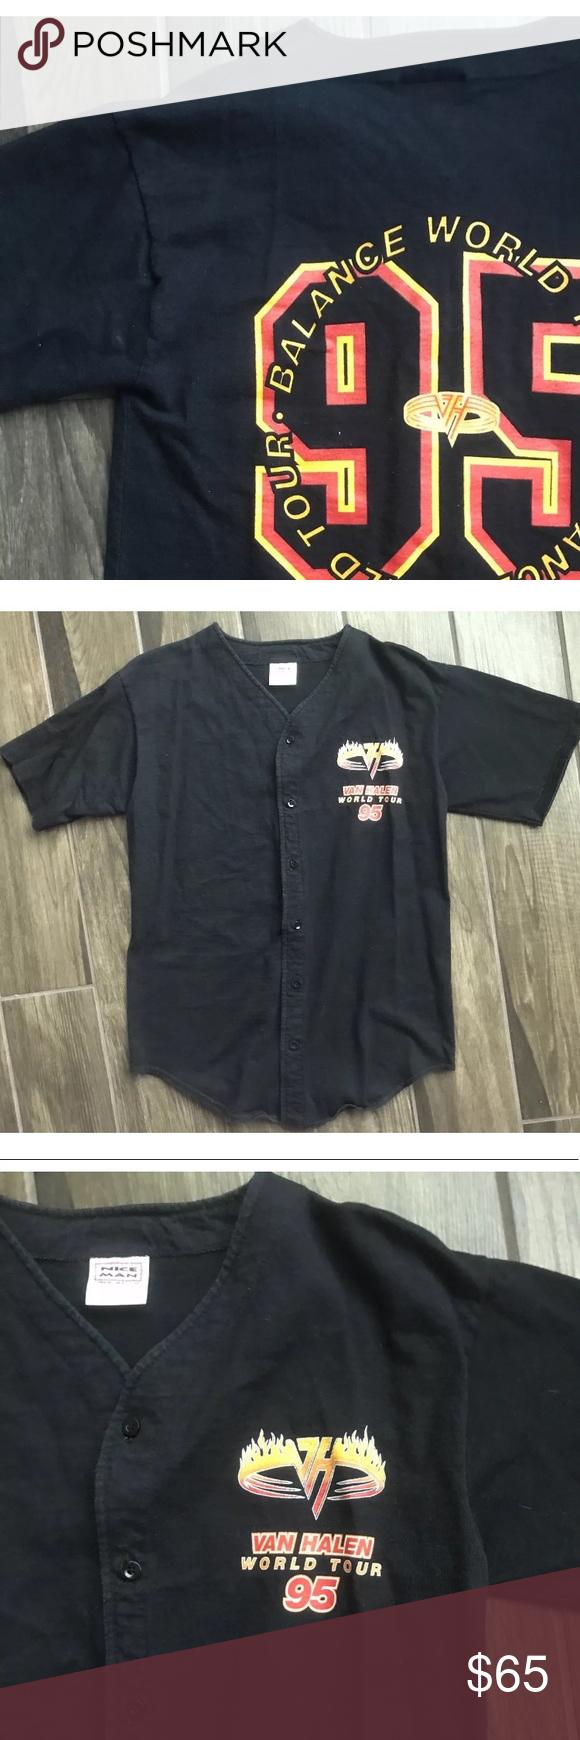 Vtg 1995 Van Halen Balance World Tour Shirt Sz L Clothes Design Branded Shirts Fashion